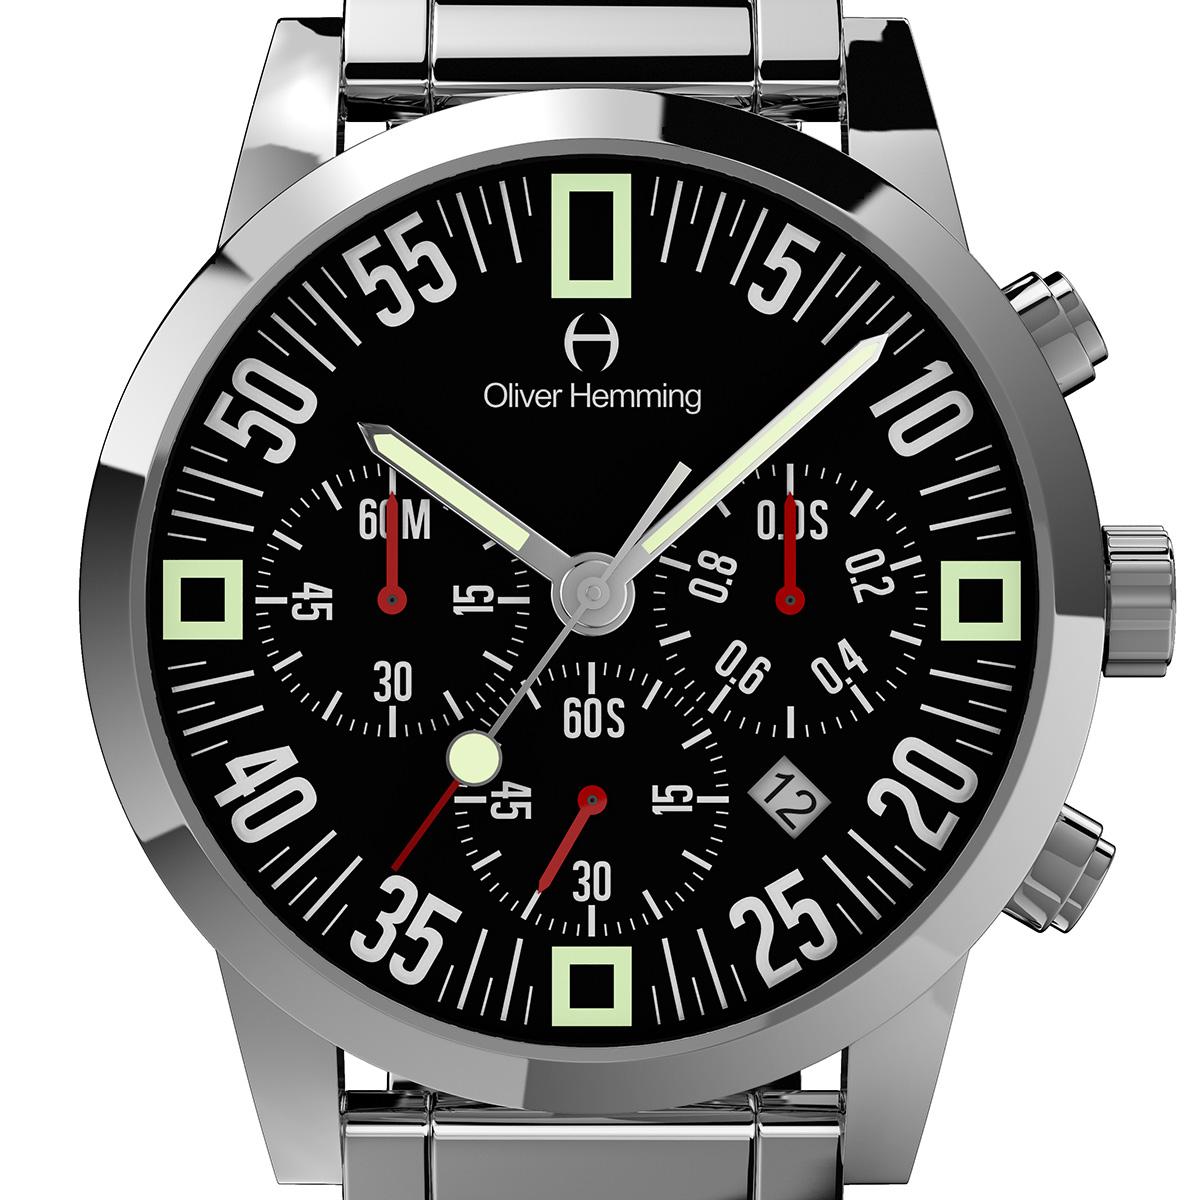 Oliver Hemming オリバーヘミング クォーツ 腕時計 イギリス アート デザイン [WTC17S80BCD] 正規代理店品 純正ケース メーカー保証